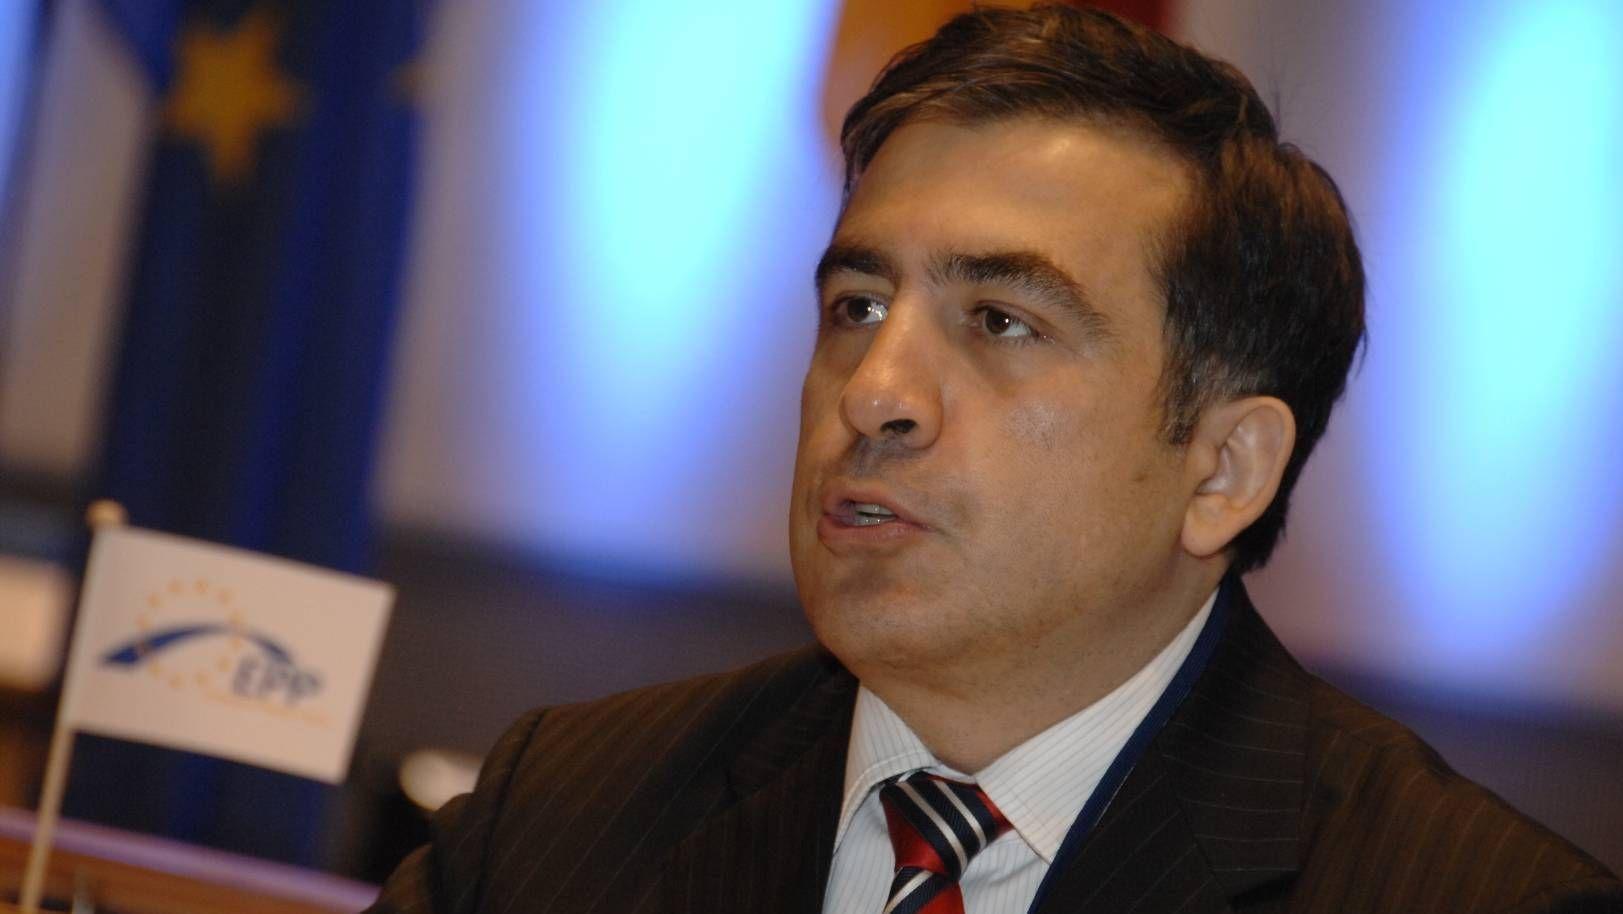 «Ситуация неготова». Саакашвили решил пока невозвращаться вГрузию